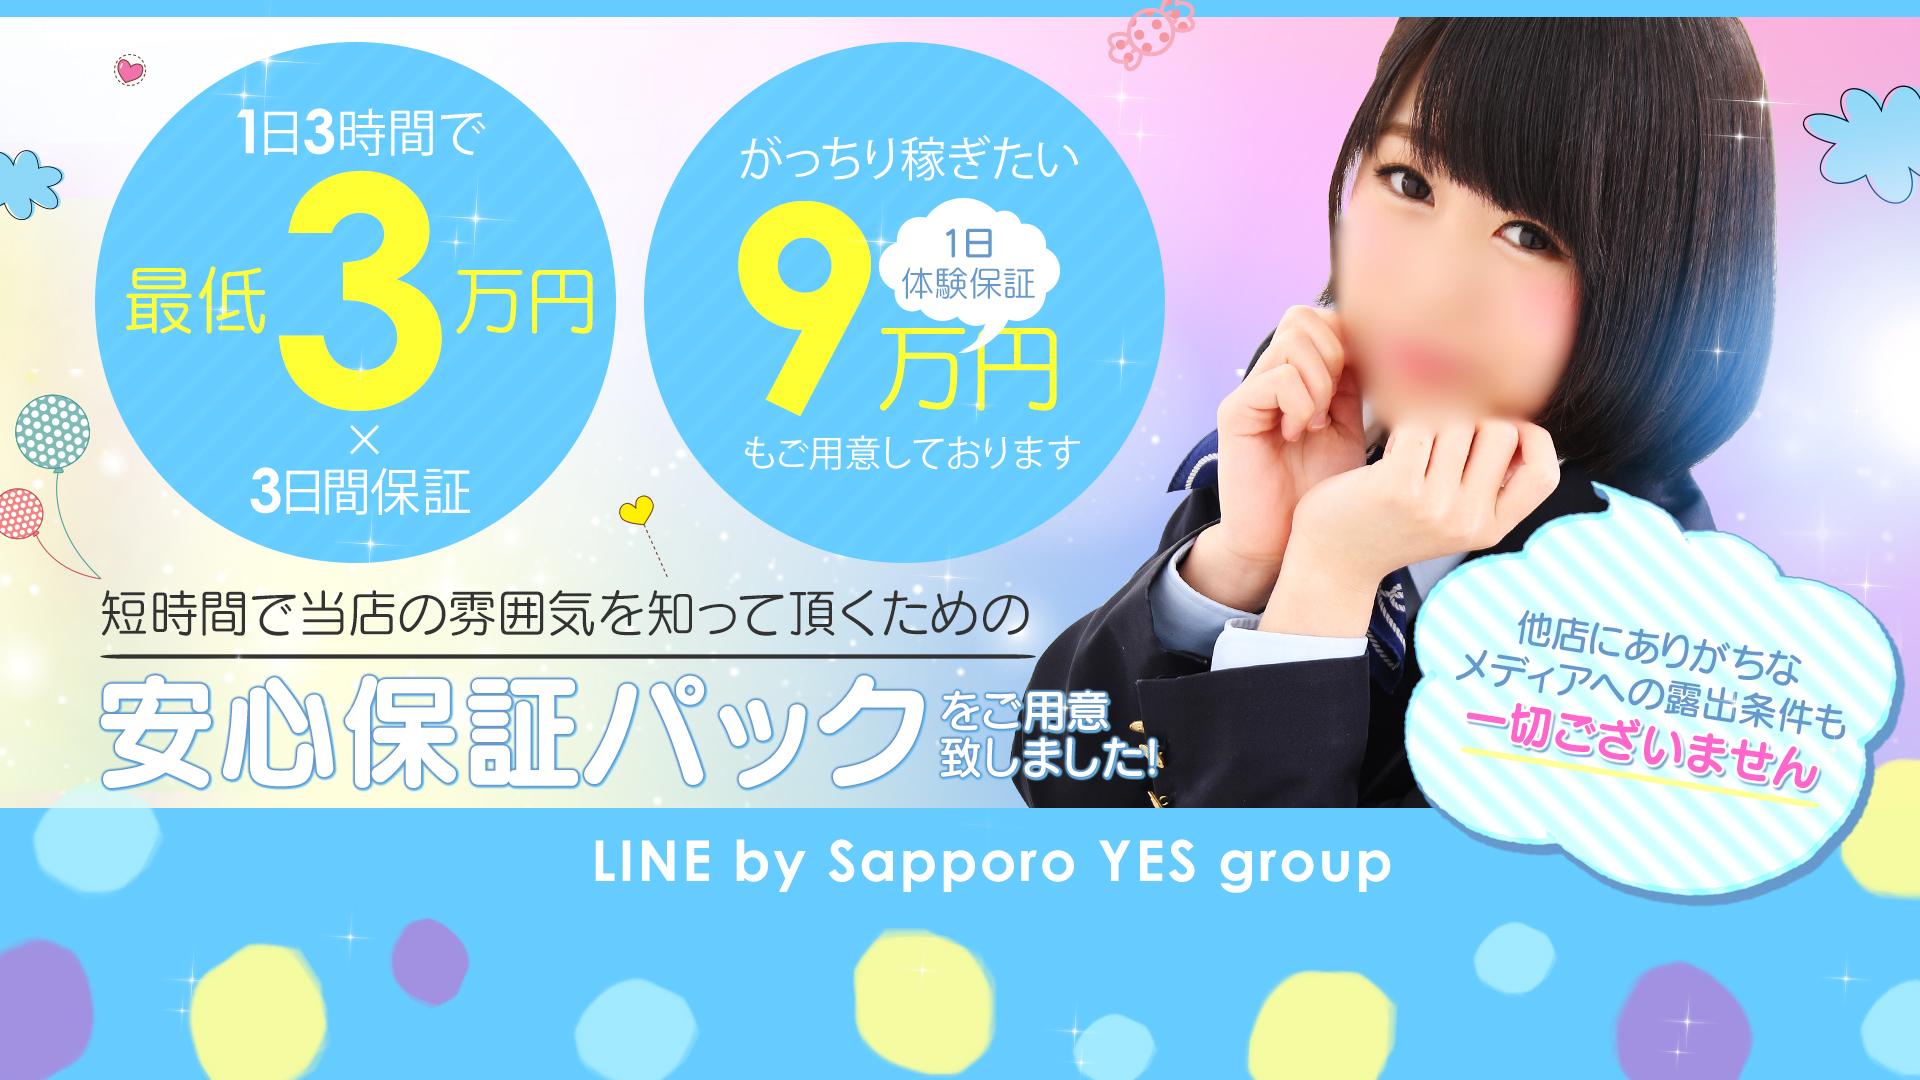 YESグループ Line